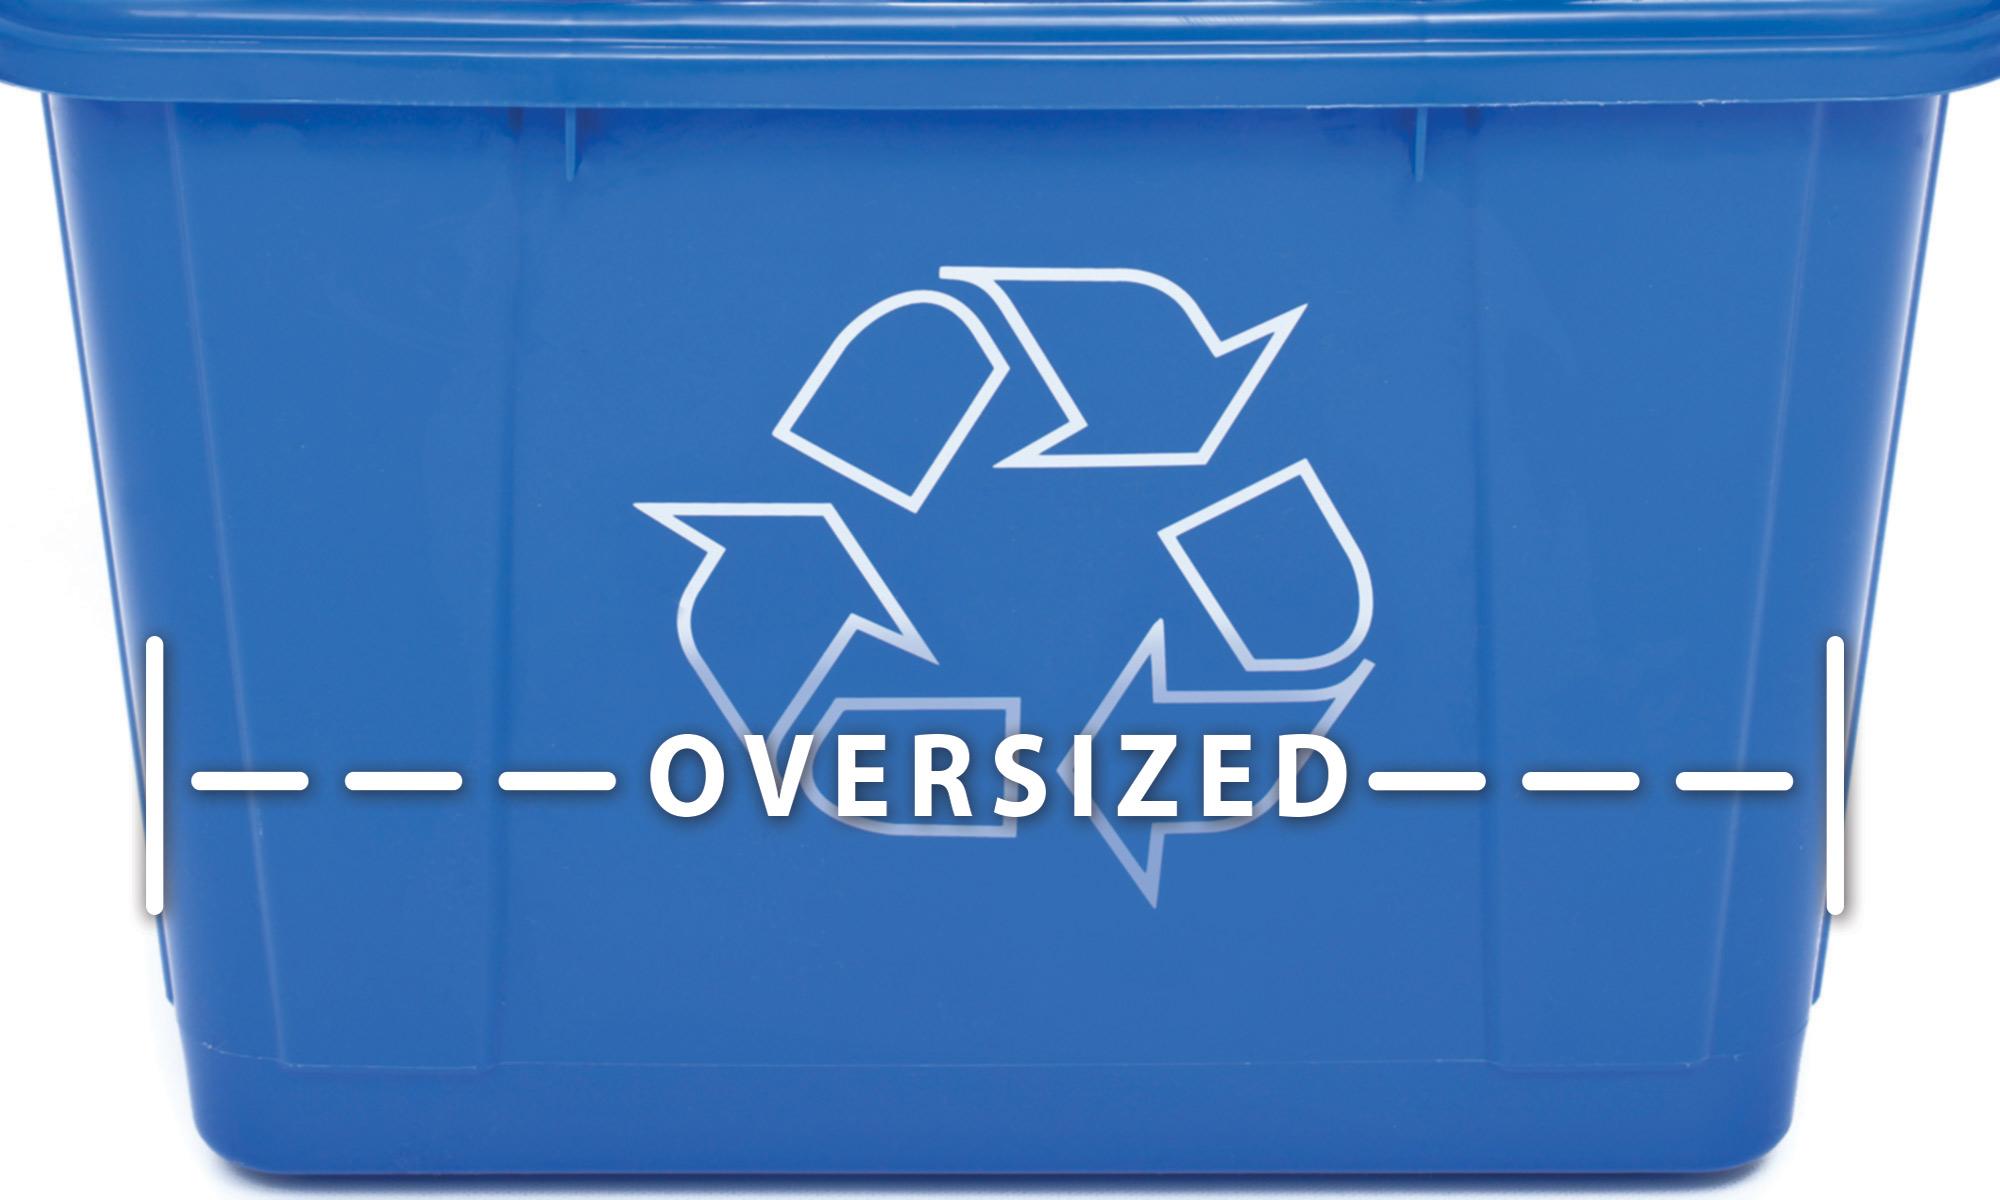 Recycling tote bin